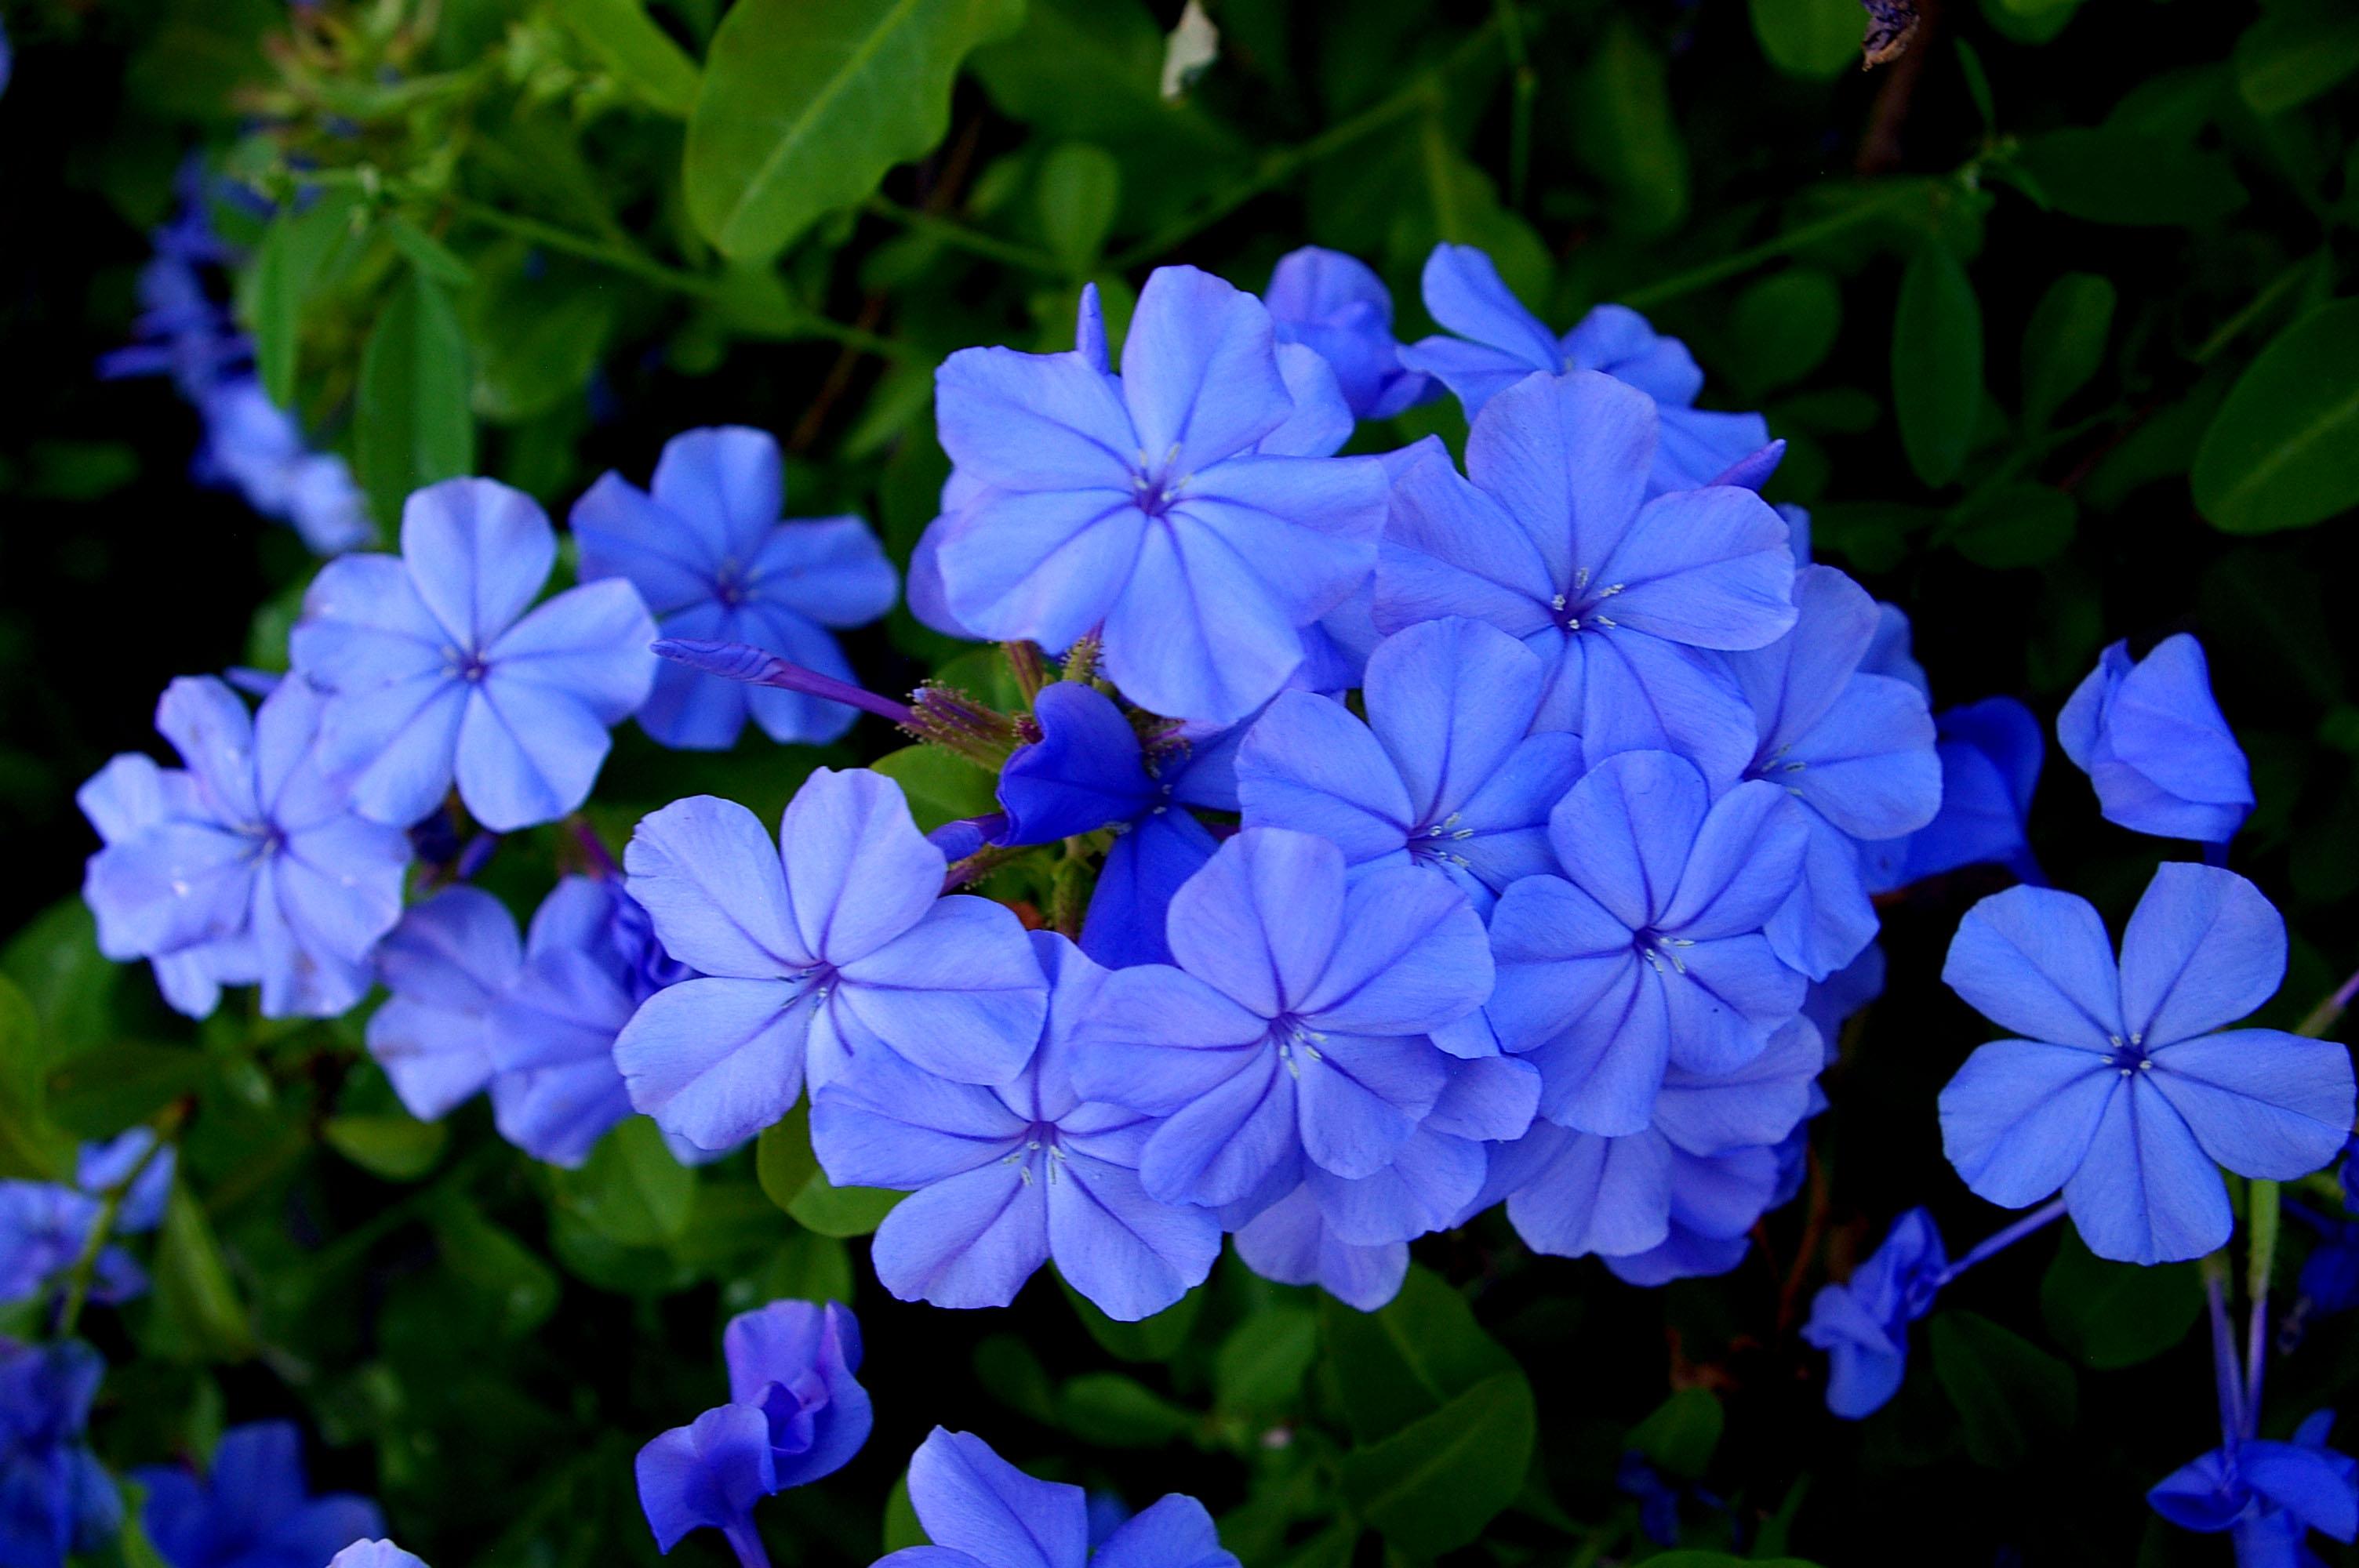 Download blue flowers 14094 3008x2000 px high definition wallpaper blue flowers 14094 izmirmasajfo